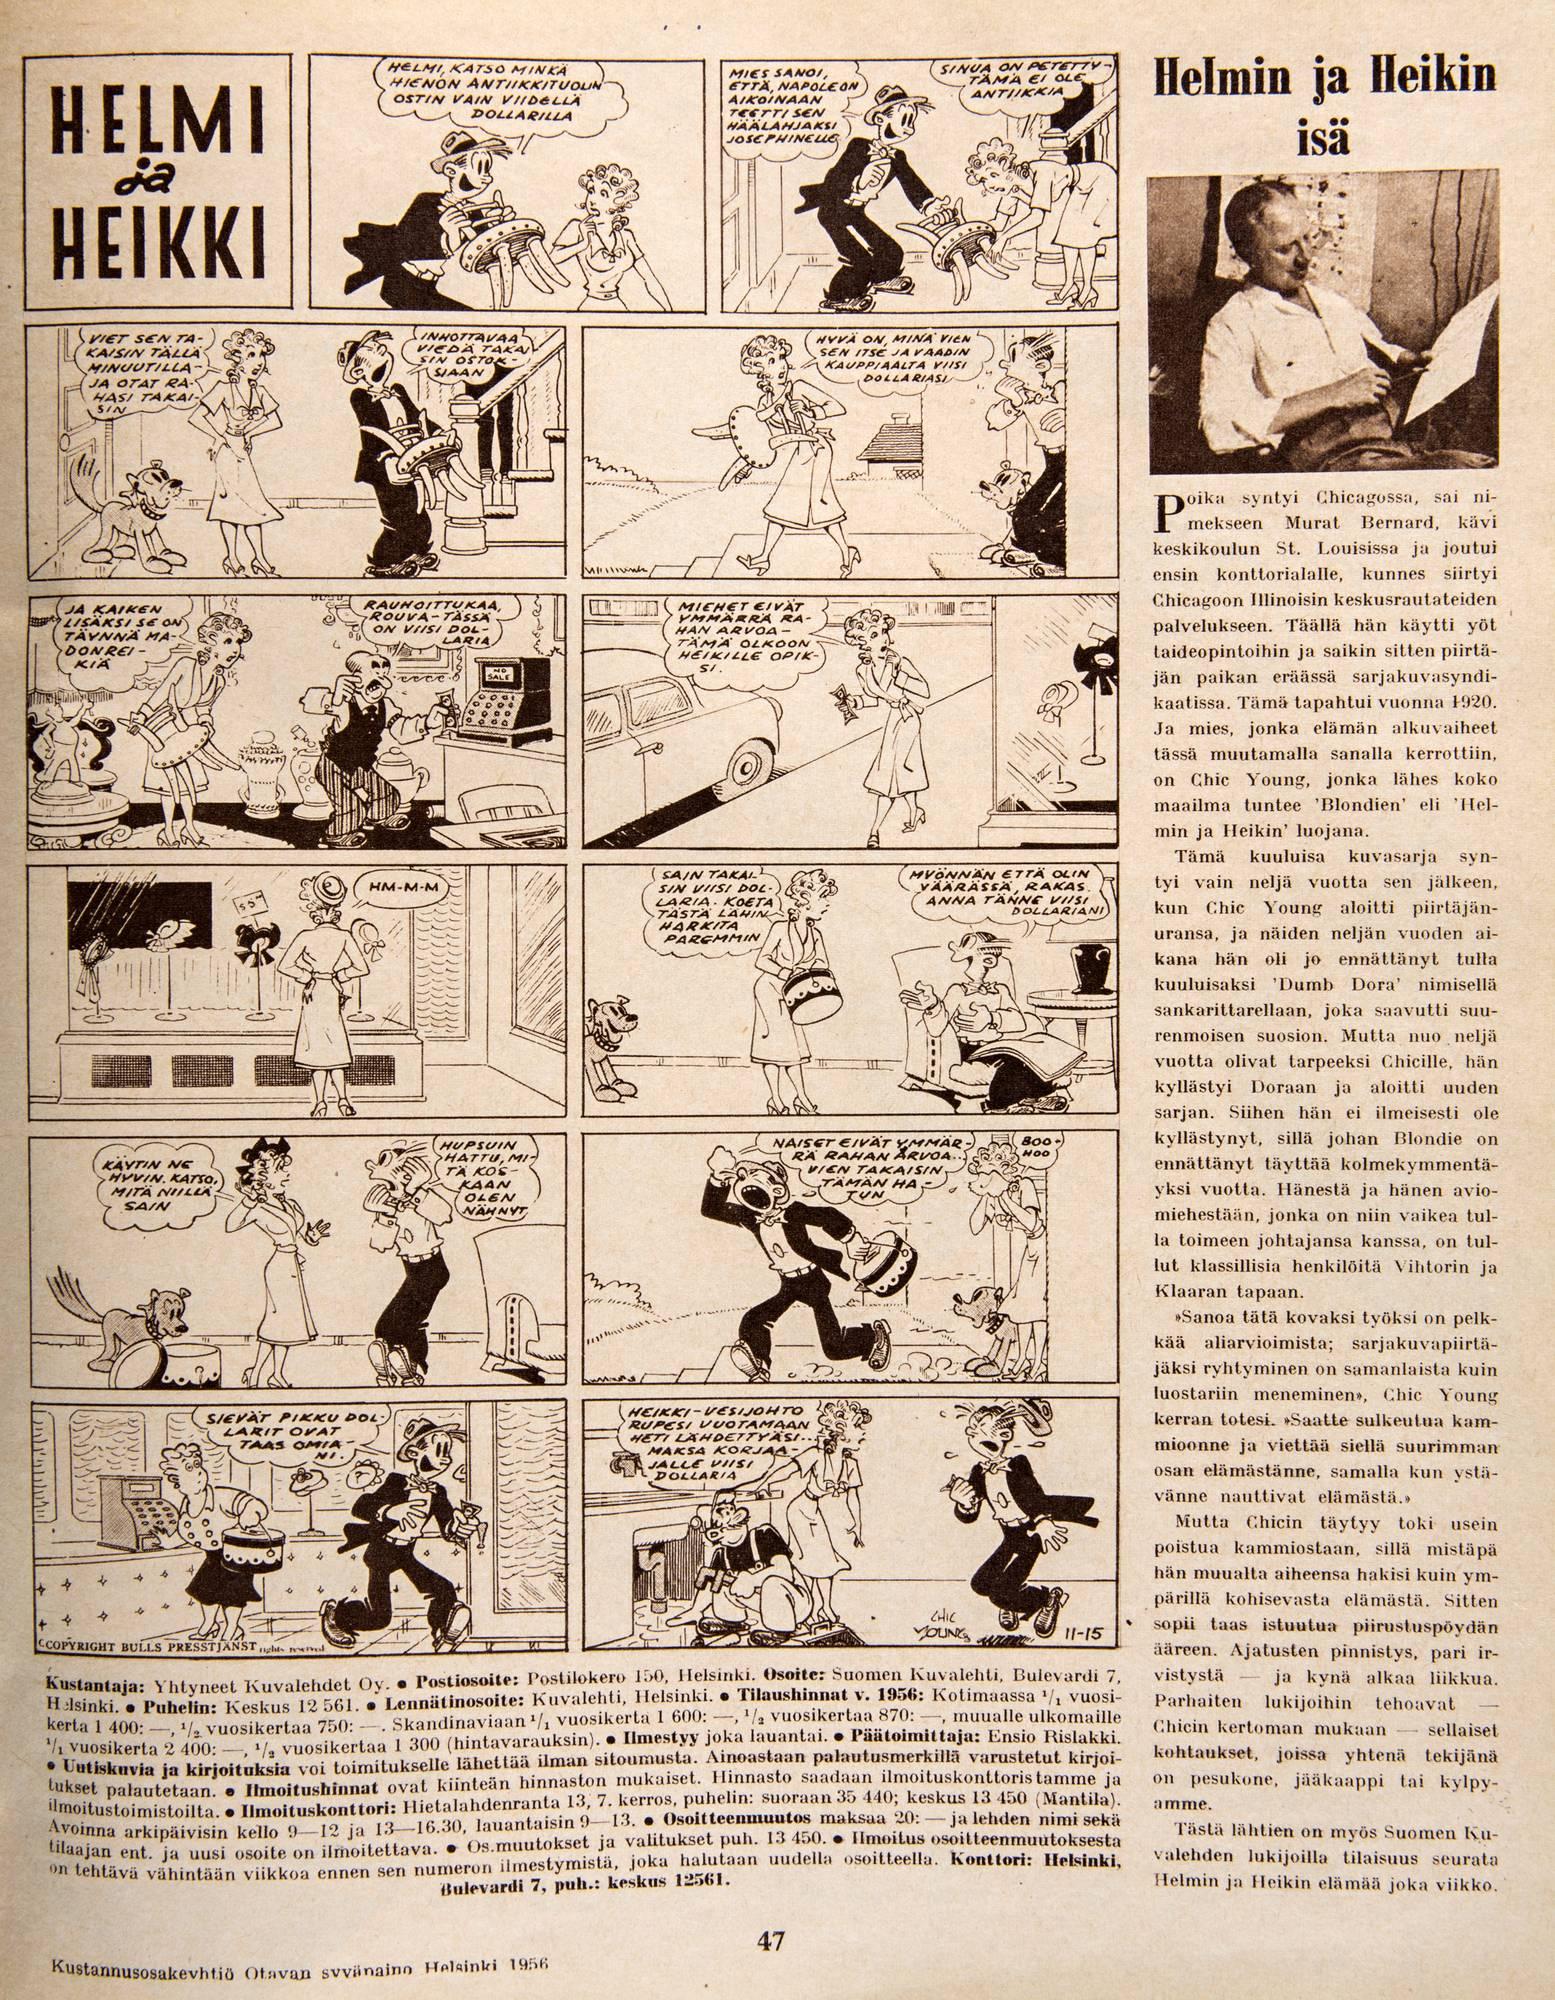 Helmi ja Heikki ensi kerran. SK 3/1956.